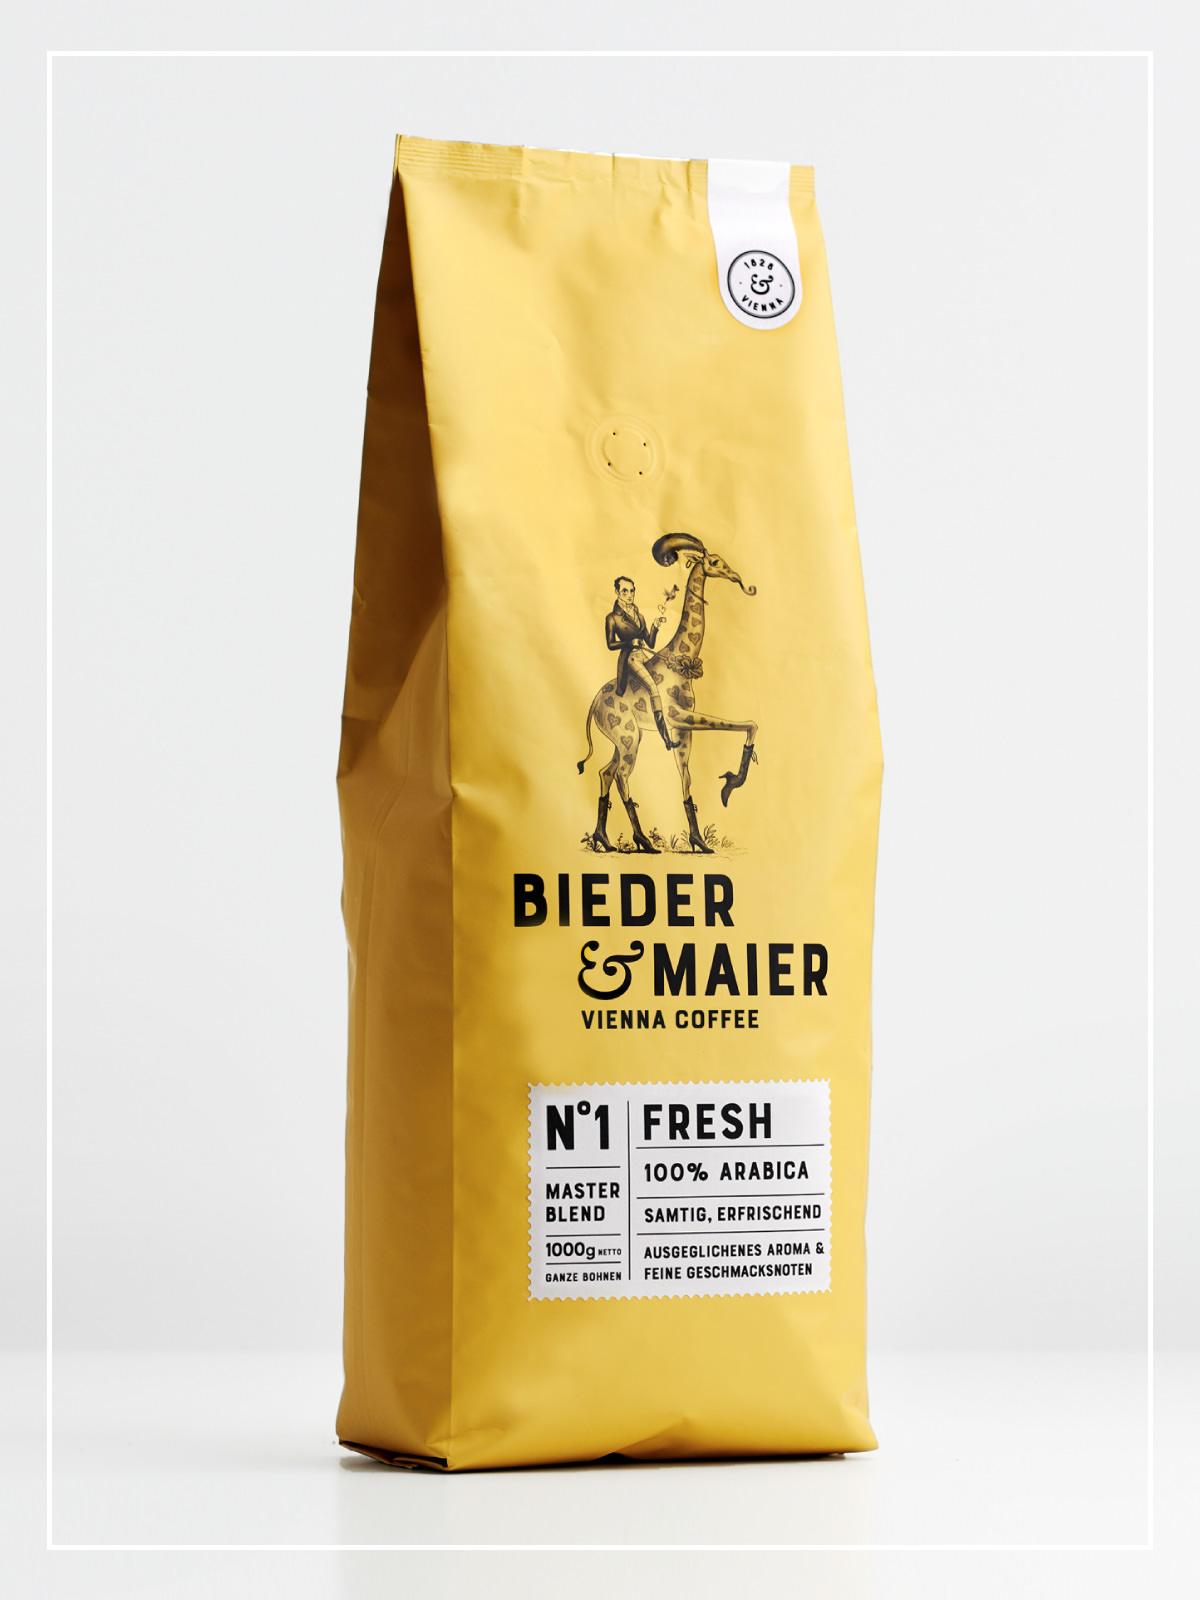 frederickandsophie-gourmet-biederundmaier-master-blend-coffee